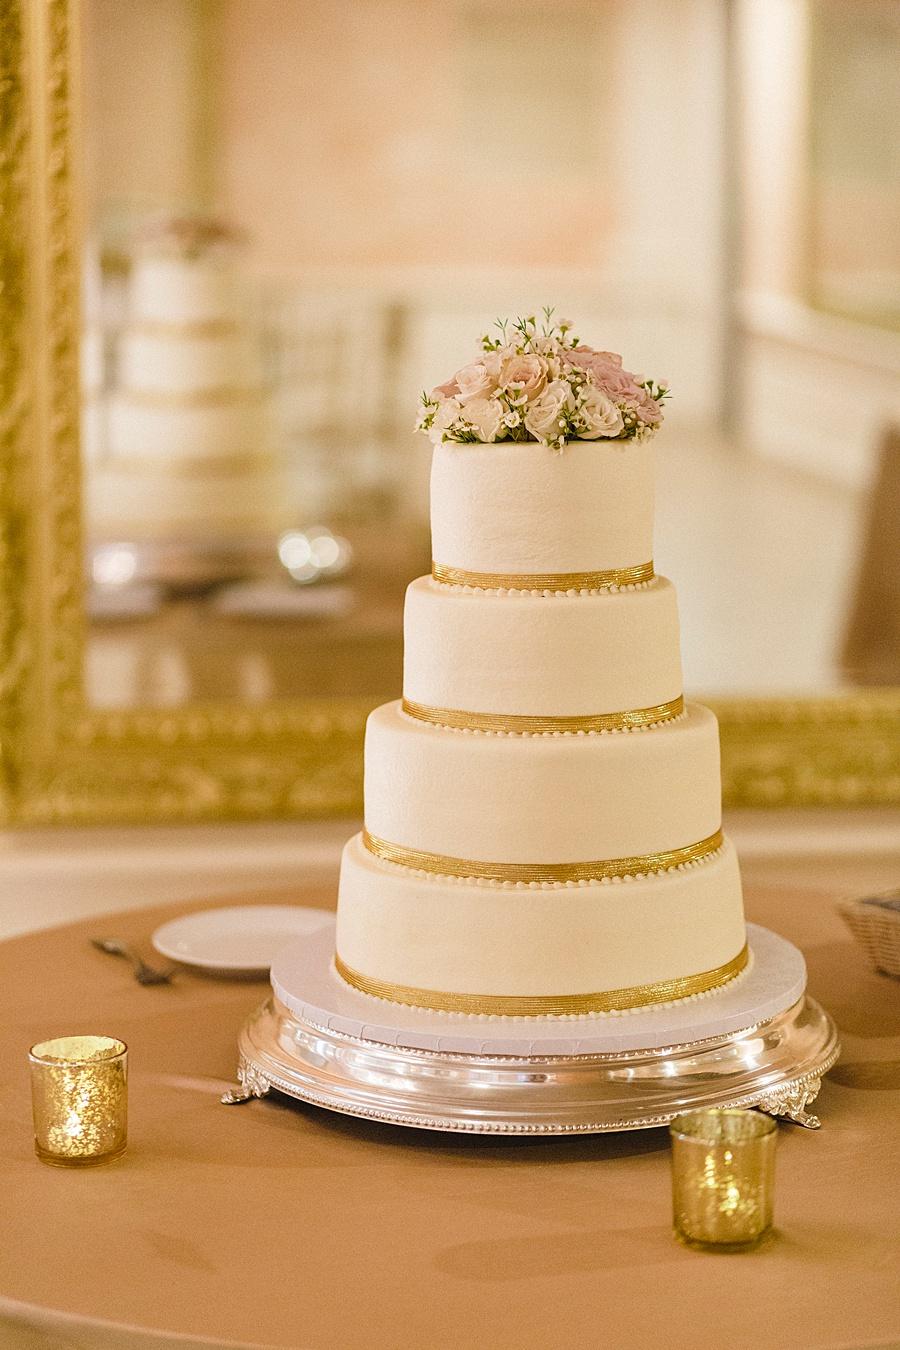 Stacy Anderson Photography Heights Villa wedding photographer_0013.jpg